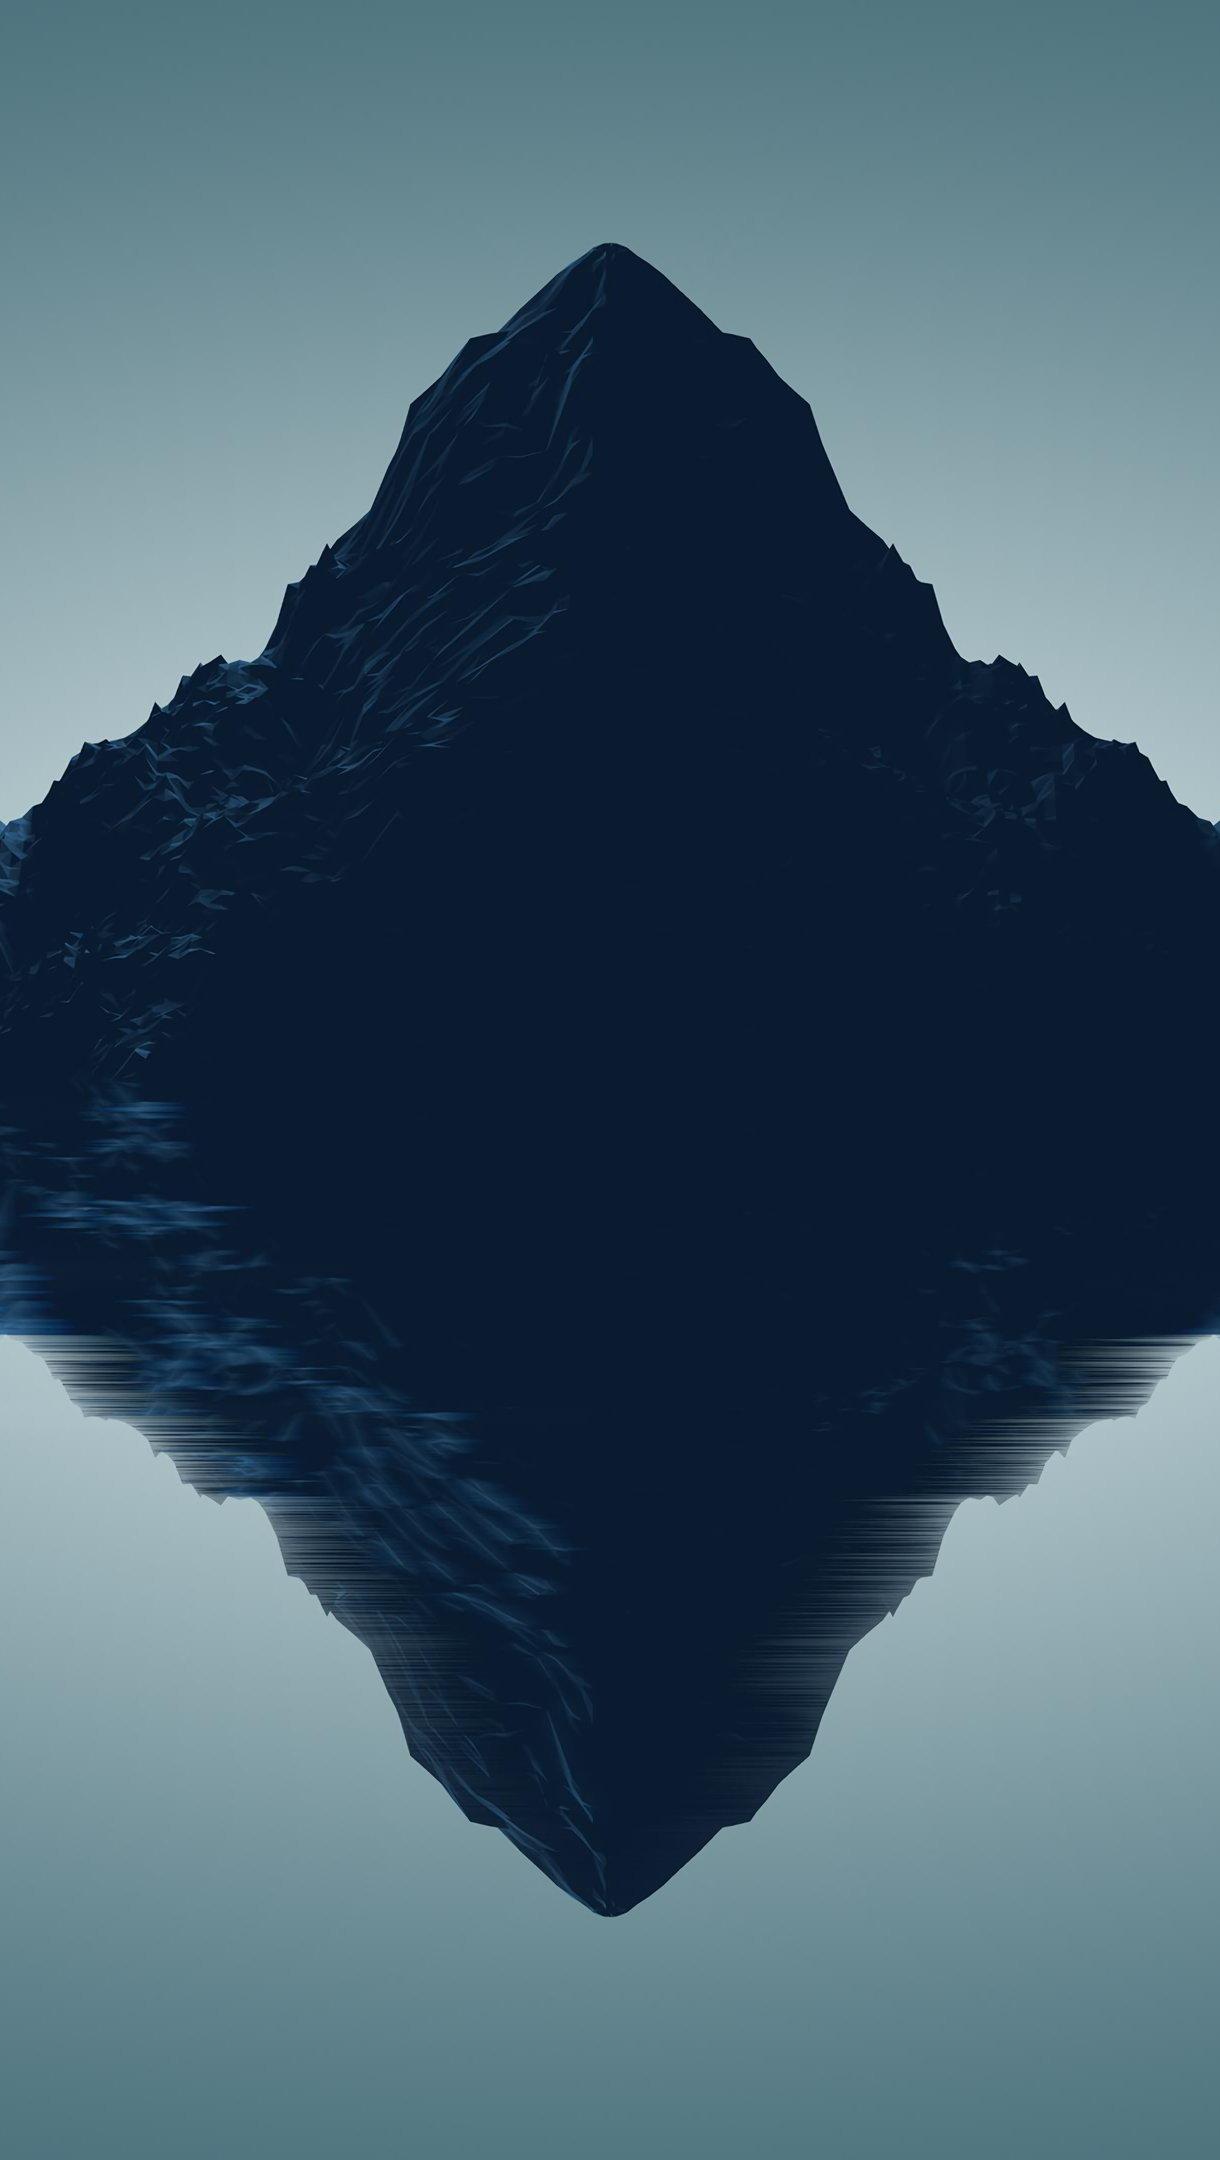 Wallpaper Mountains Minimalist Low Poly Art Vertical